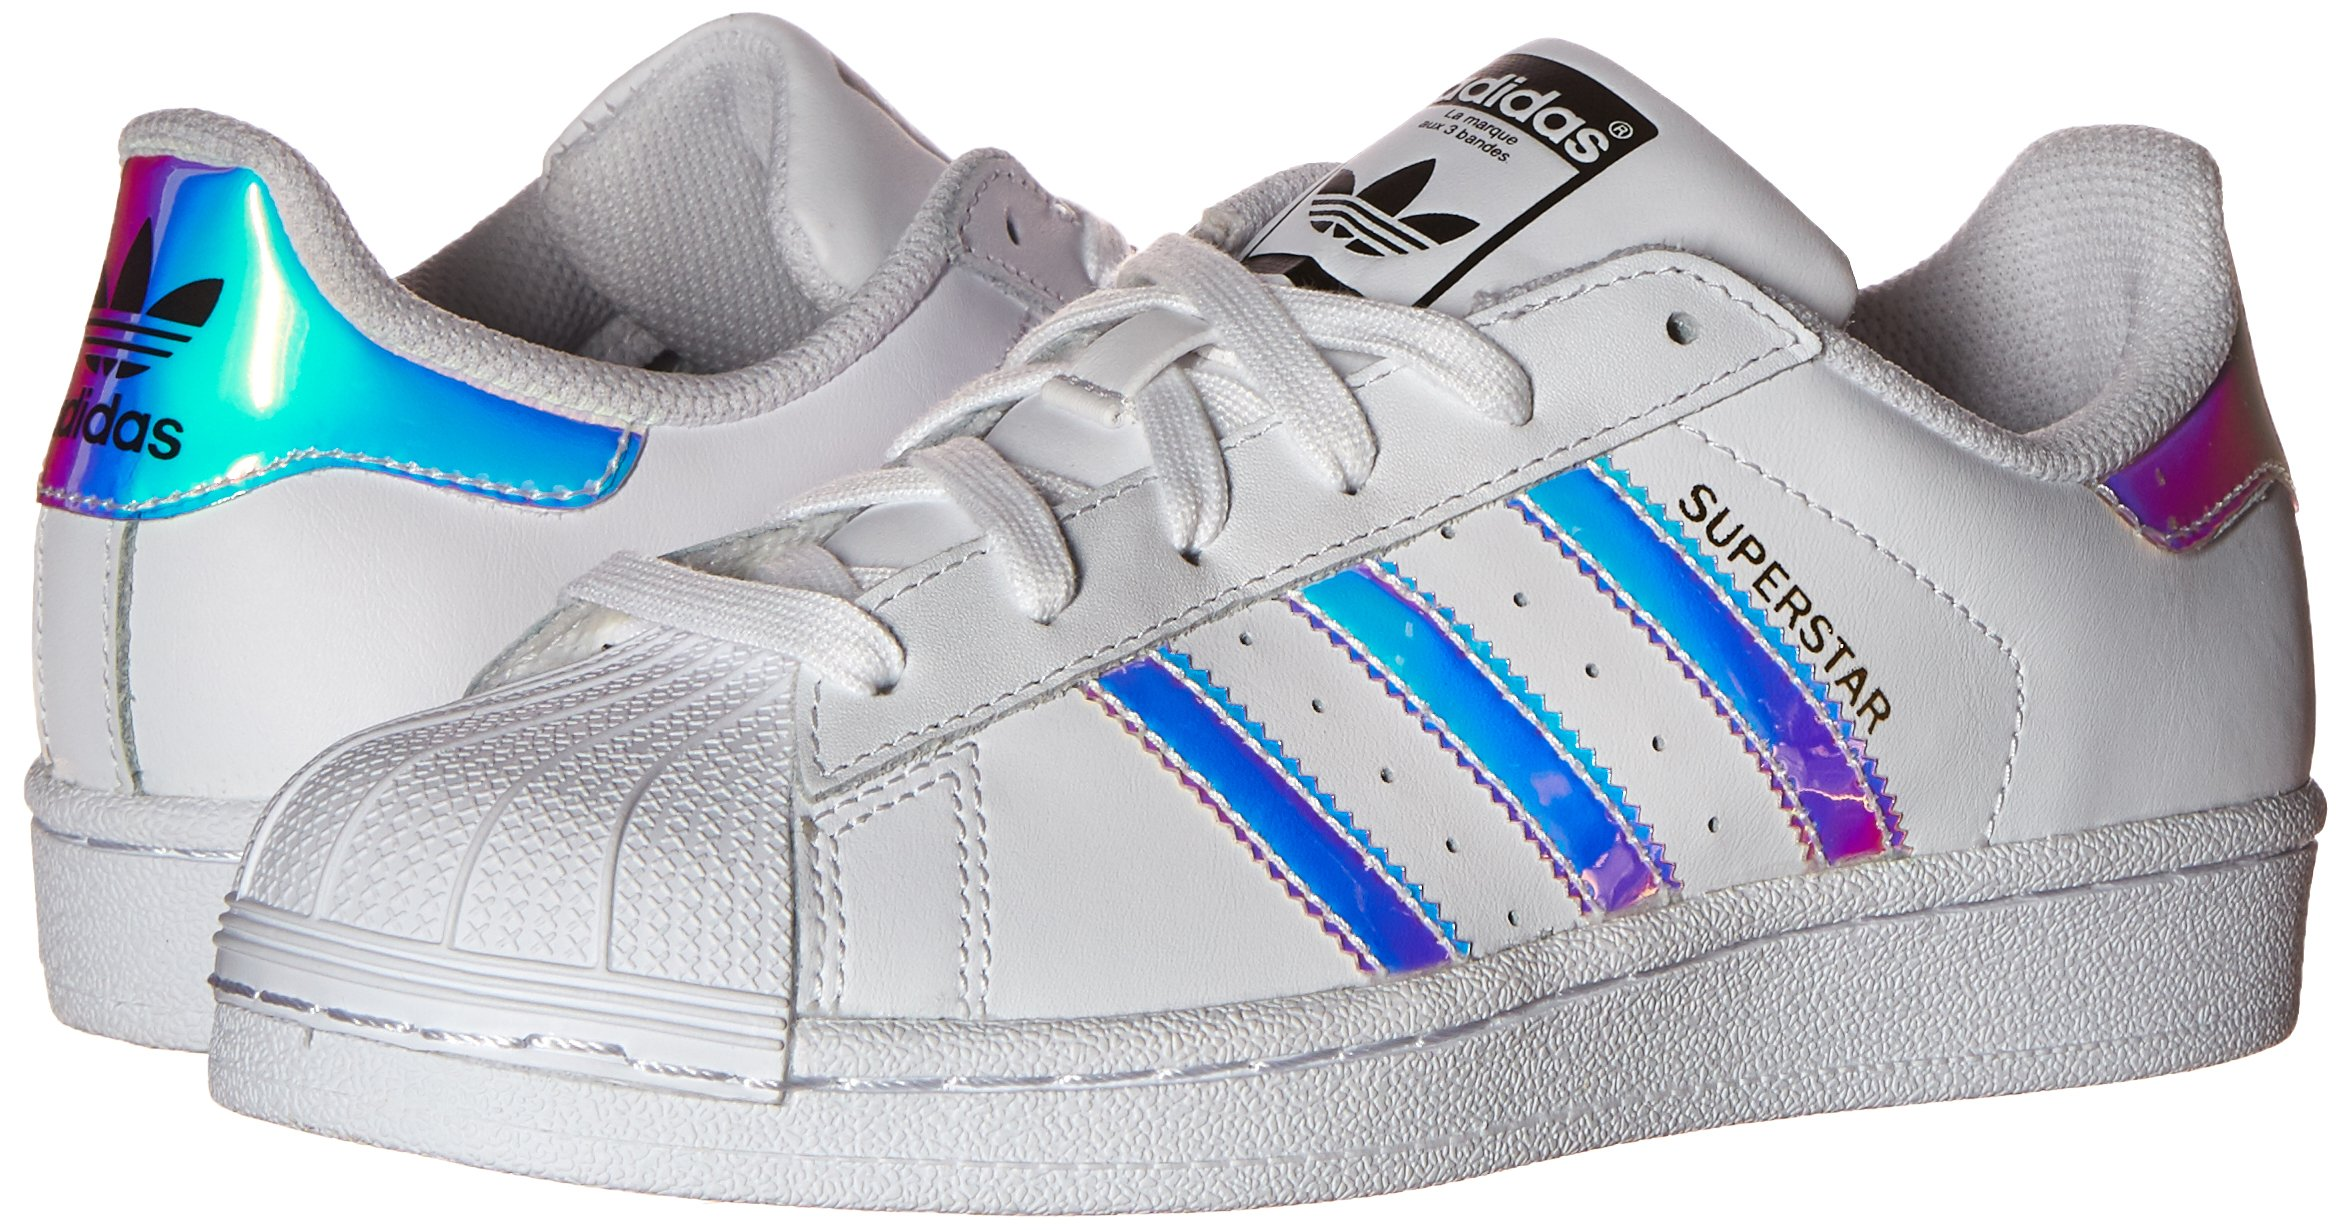 adidas Originals Kid's Superstar J Shoe, White/White/Metallic Silver, 4 M US Big Kid by adidas Originals (Image #6)